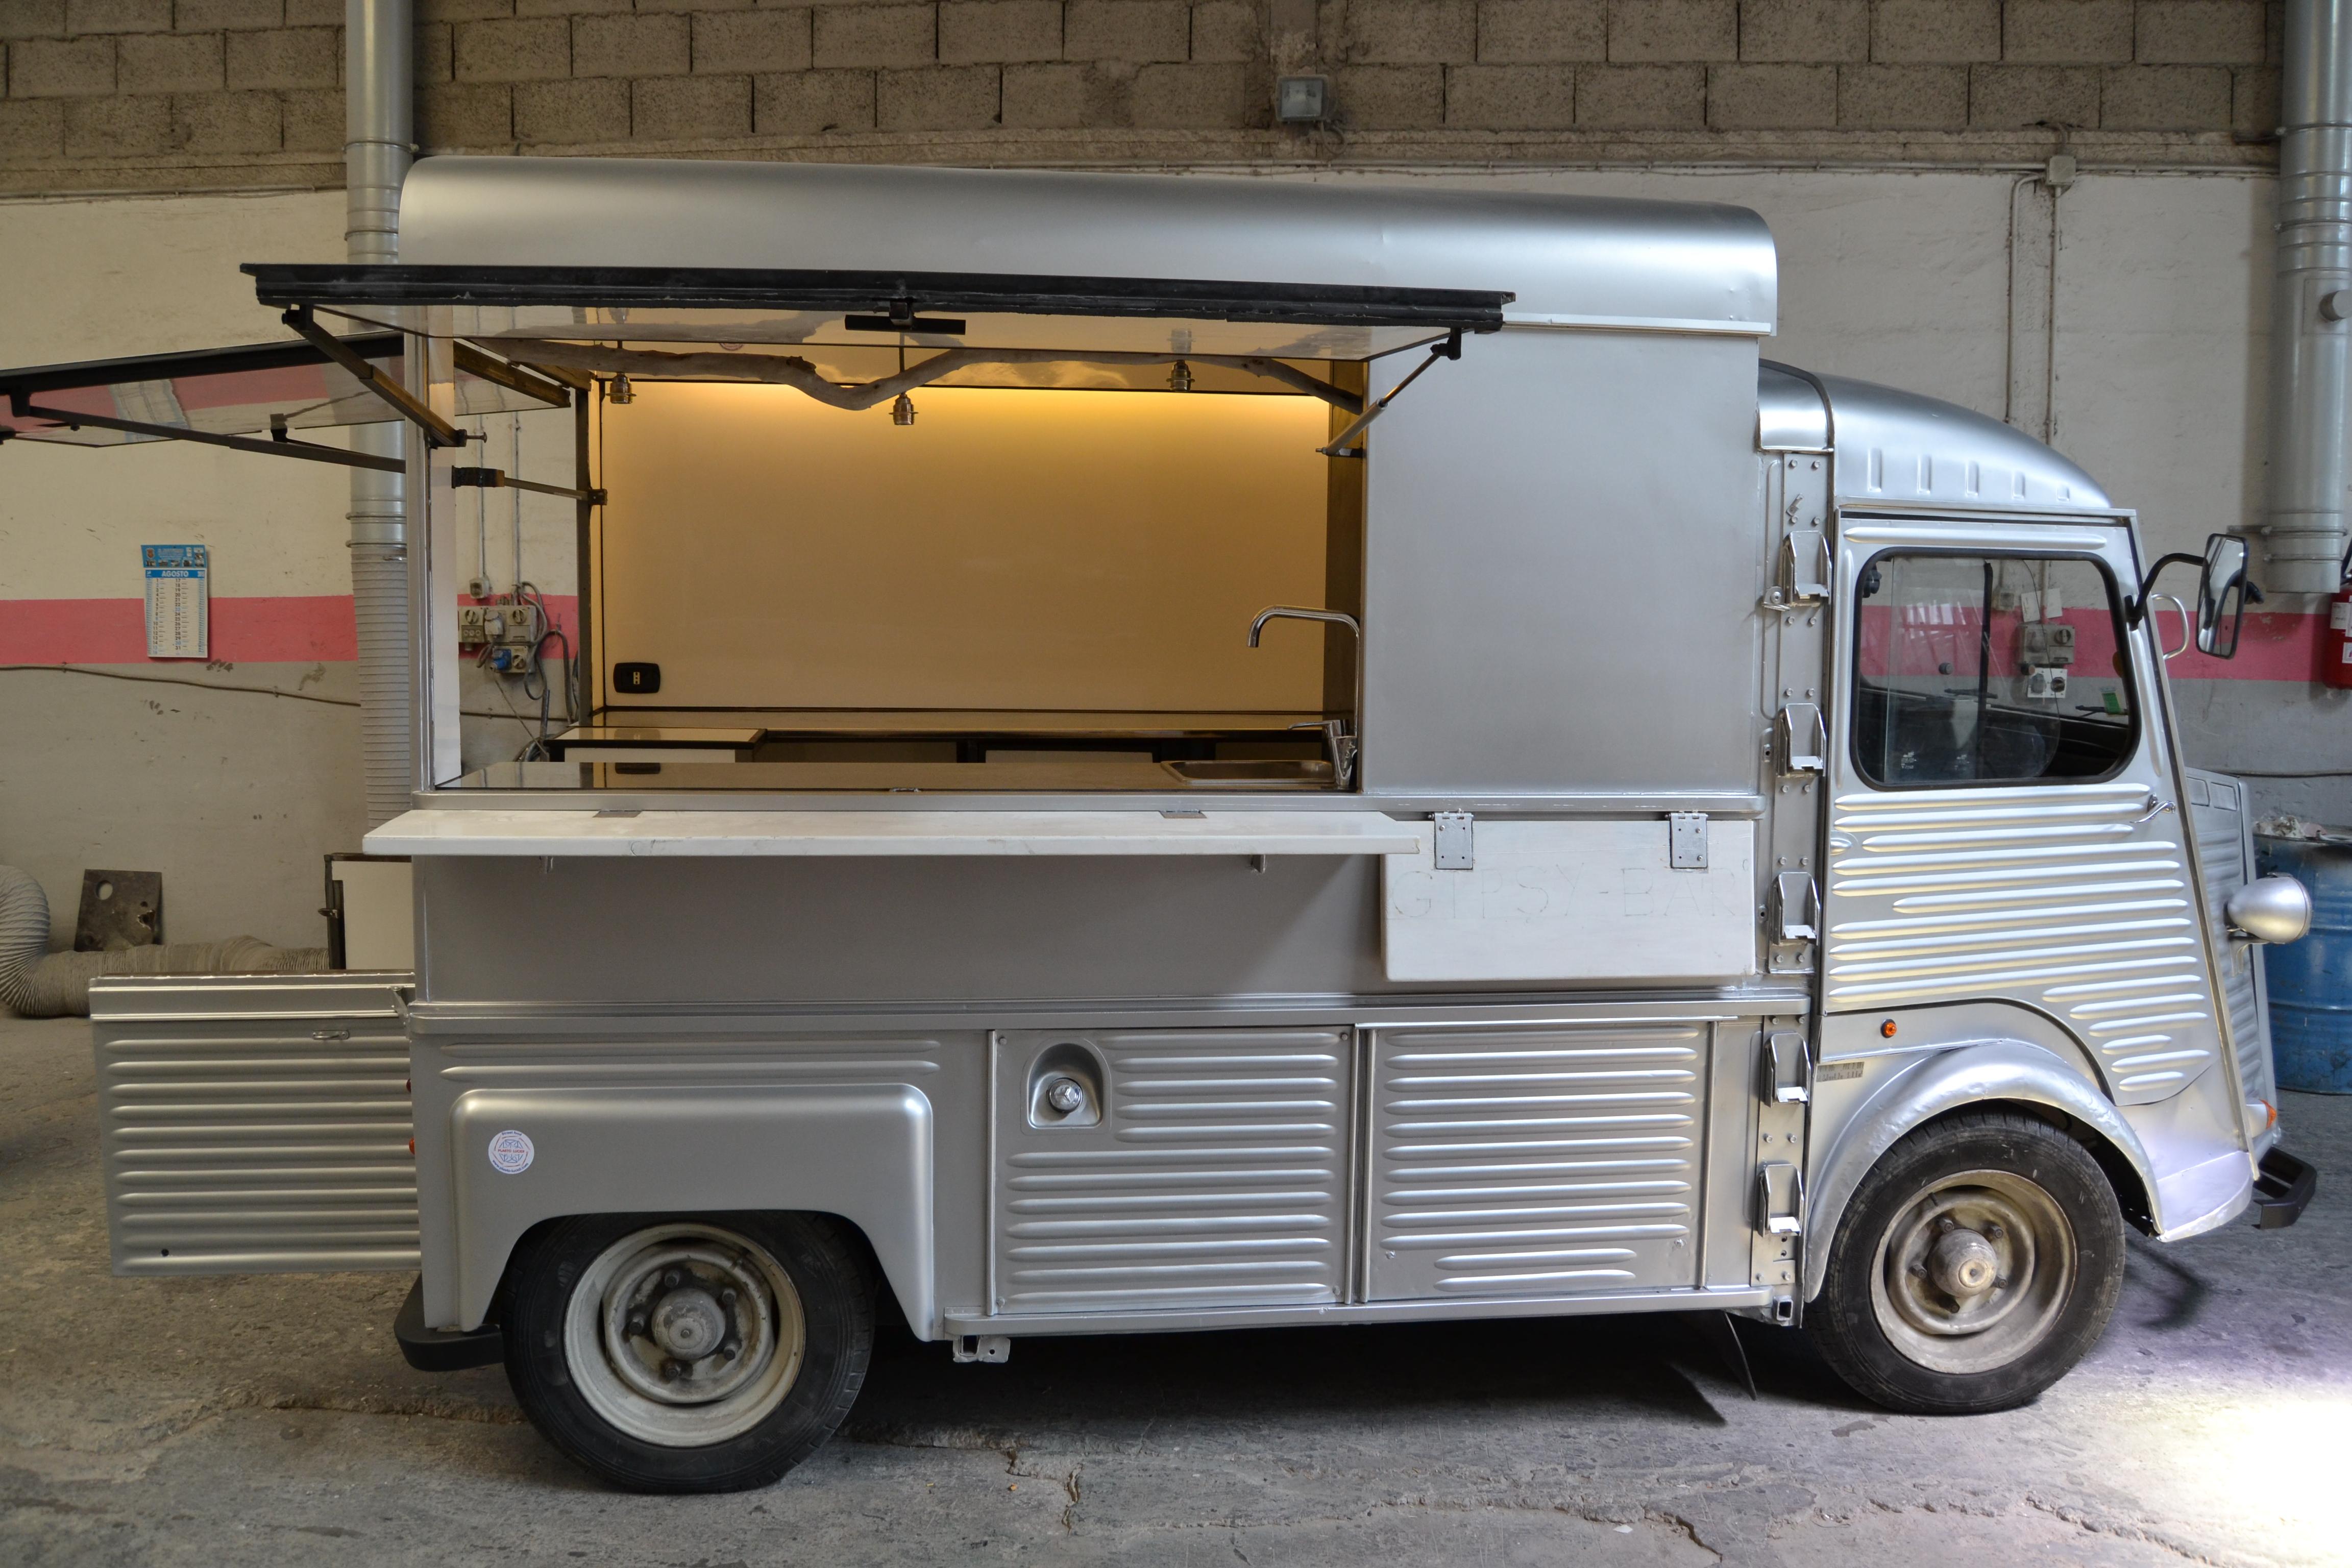 Via Napoli Food Truck